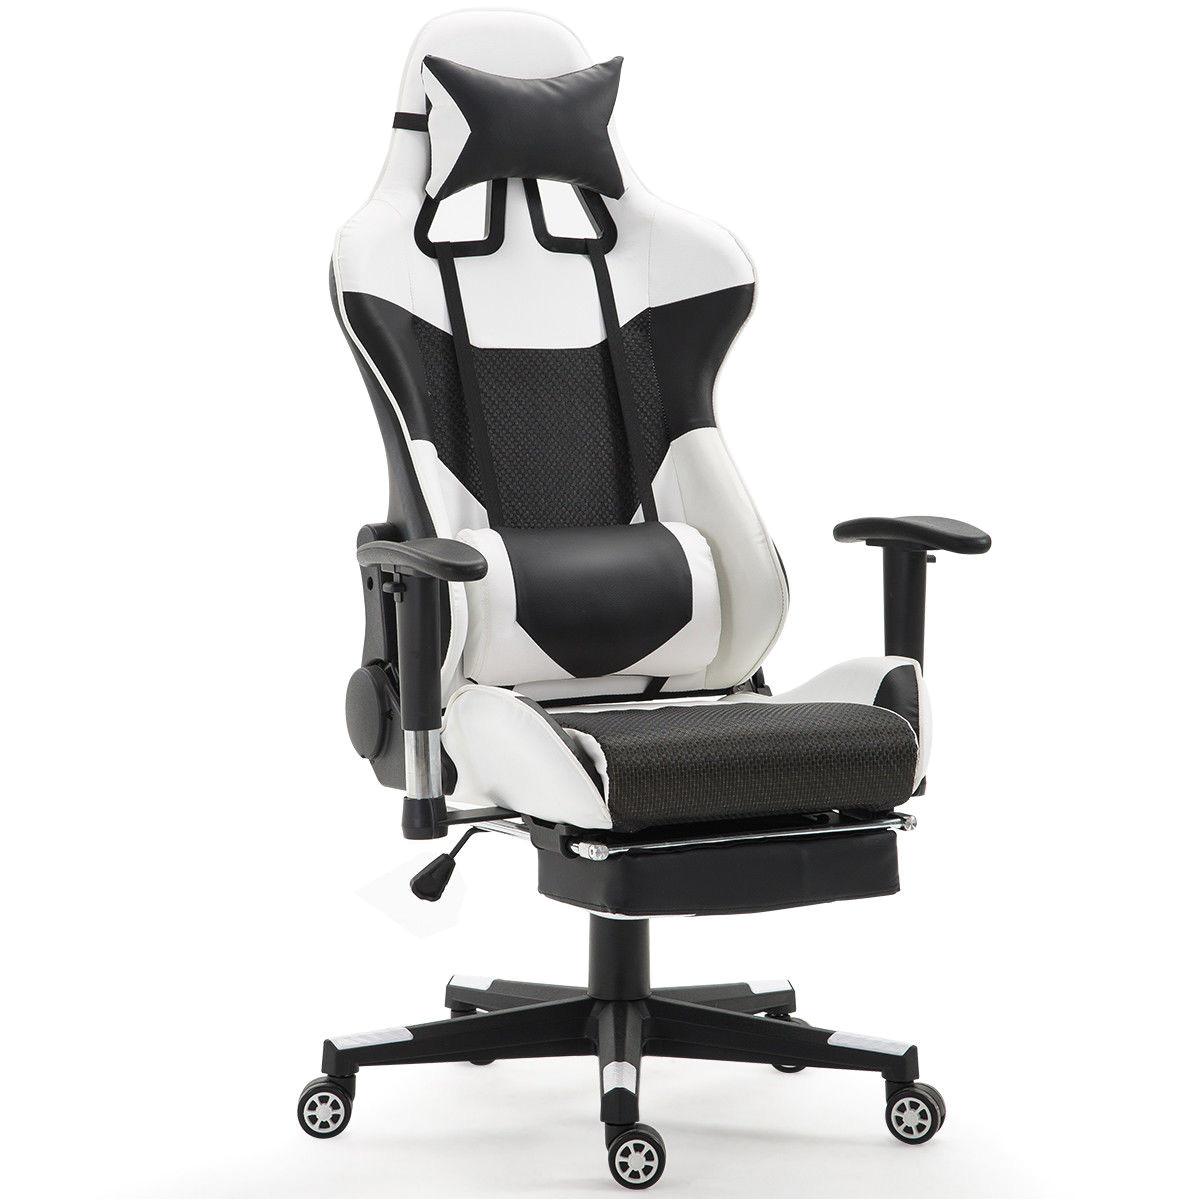 Ergonomic Office Chair with Leg Rest Giantex Ergonomic Adjustable Gaming Chair Modern High Back Racing